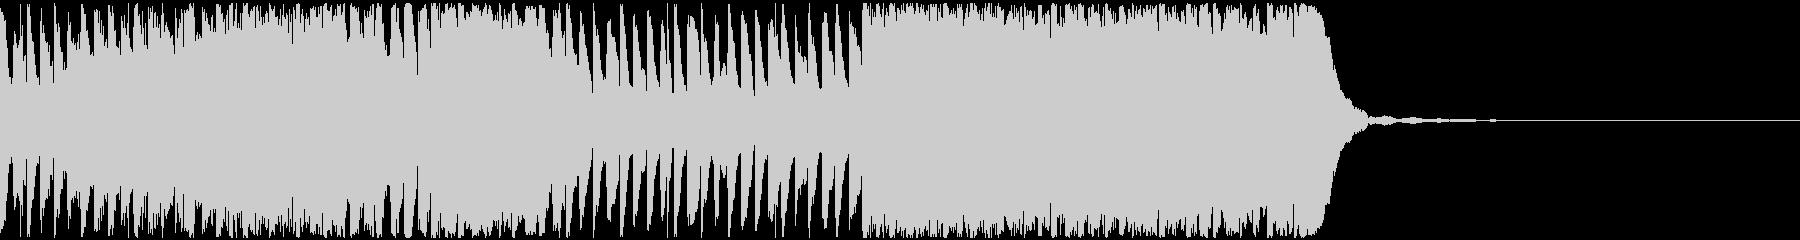 【EDM】30秒、ジングル1の未再生の波形